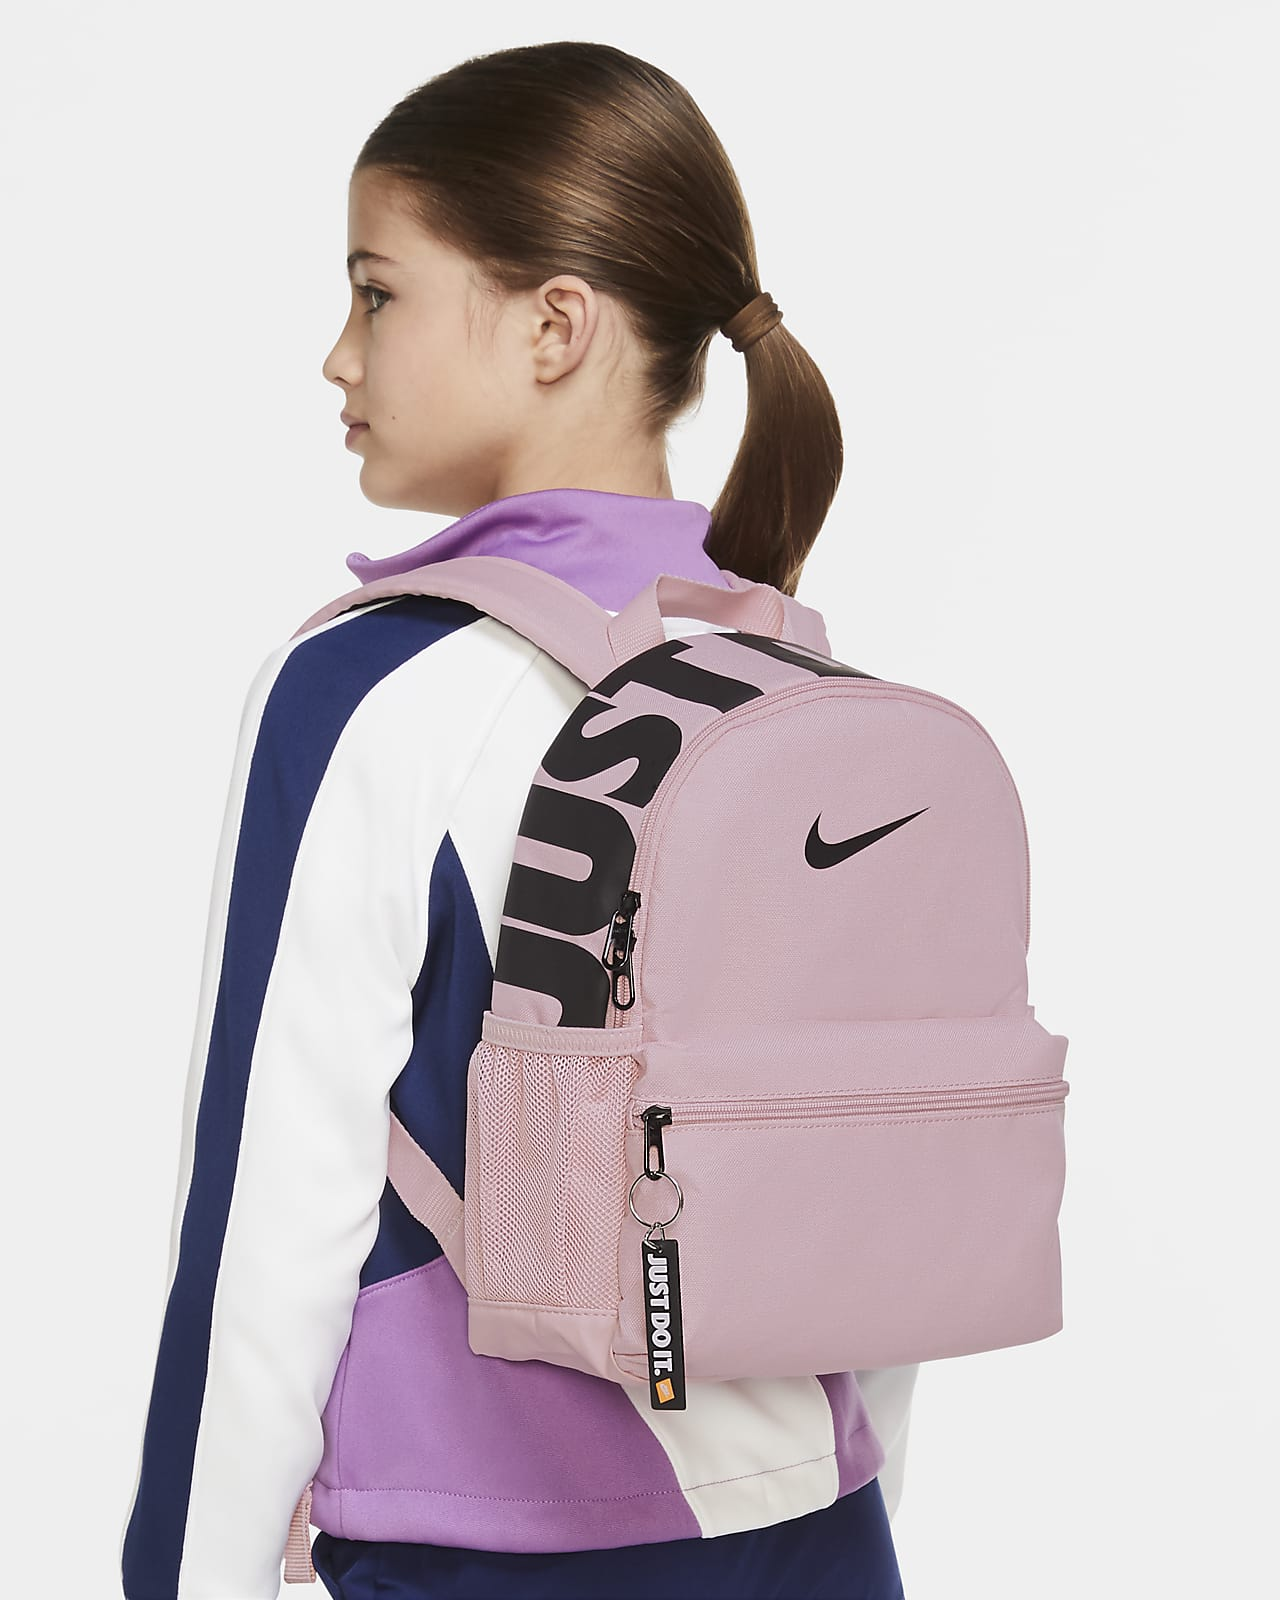 Mochila Nike Brasilia JDI para criança (Mini)